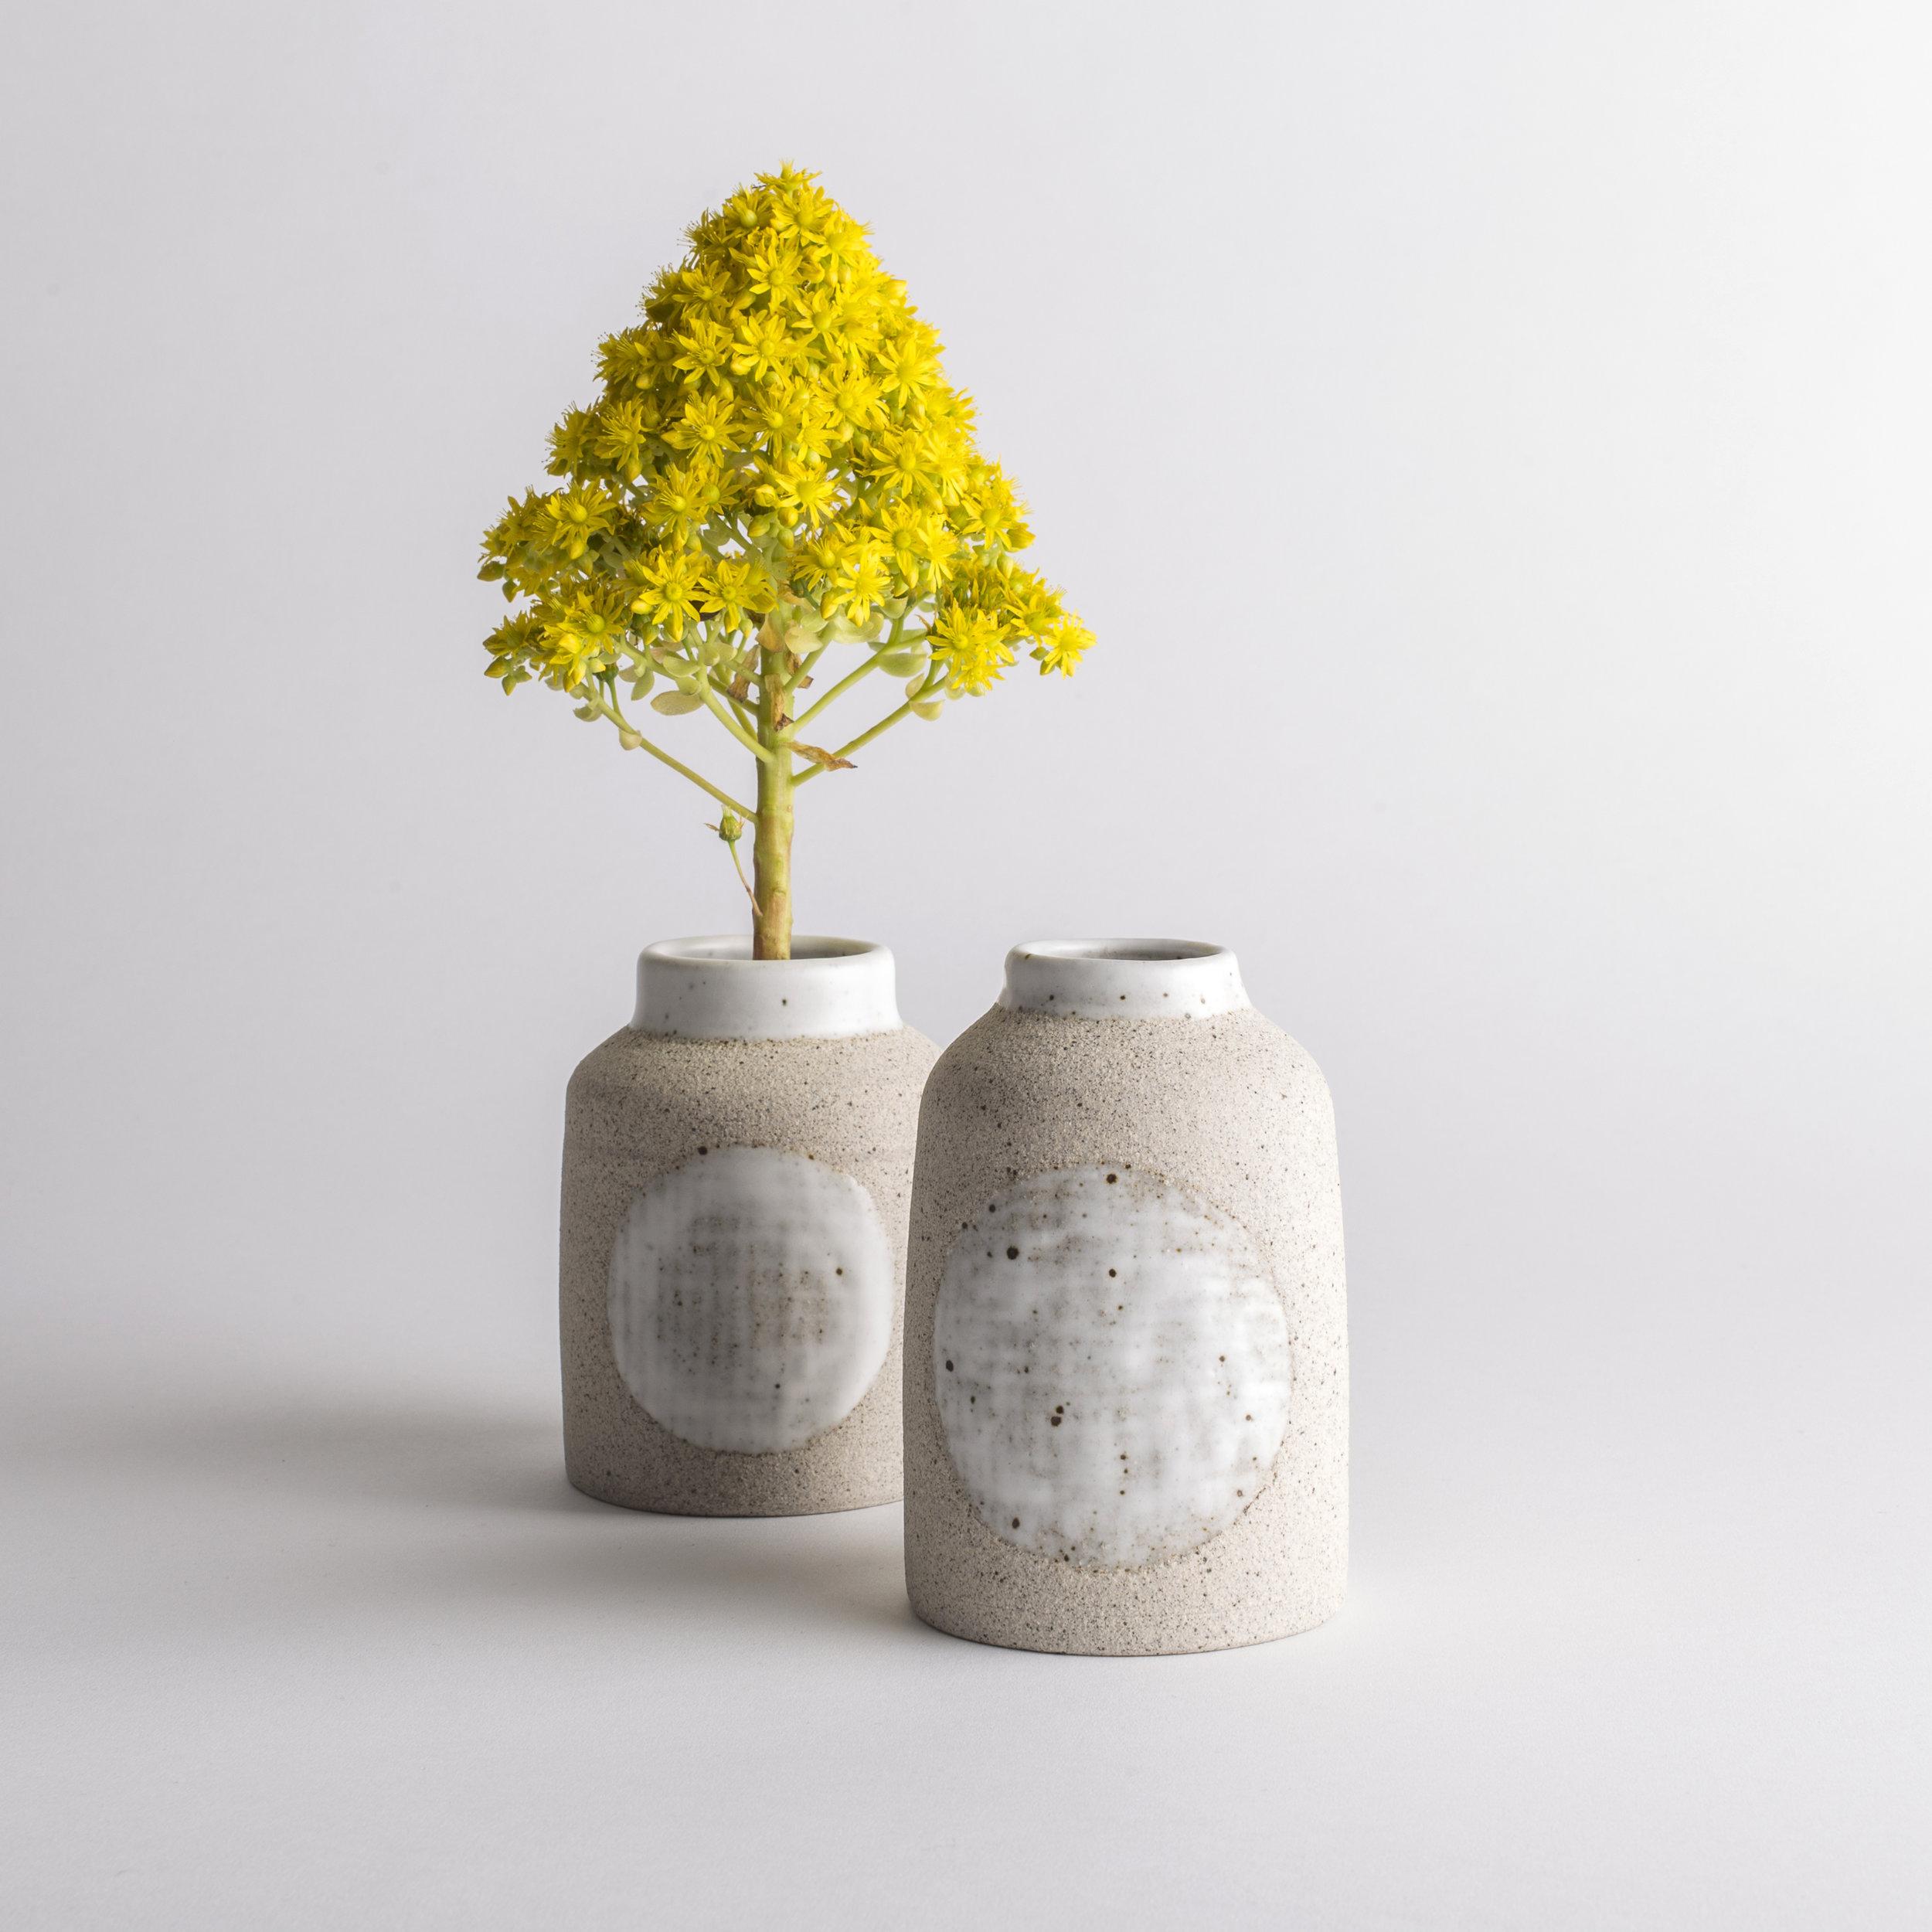 Ceramics-15autocontrast.jpg